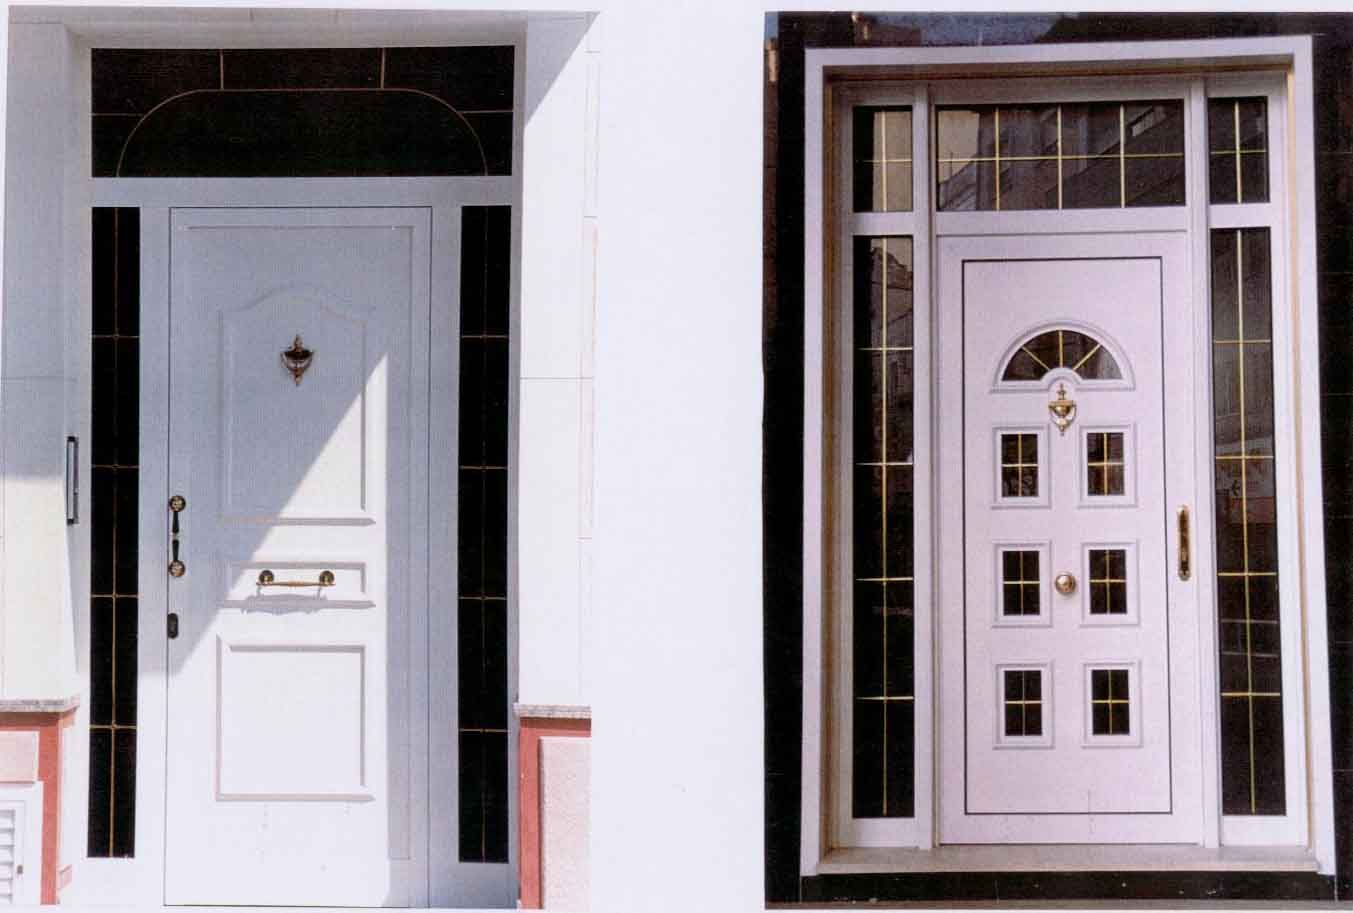 Catalogo de puertas de aluminio puertas pinterest for Catalogo puertas minimalistas